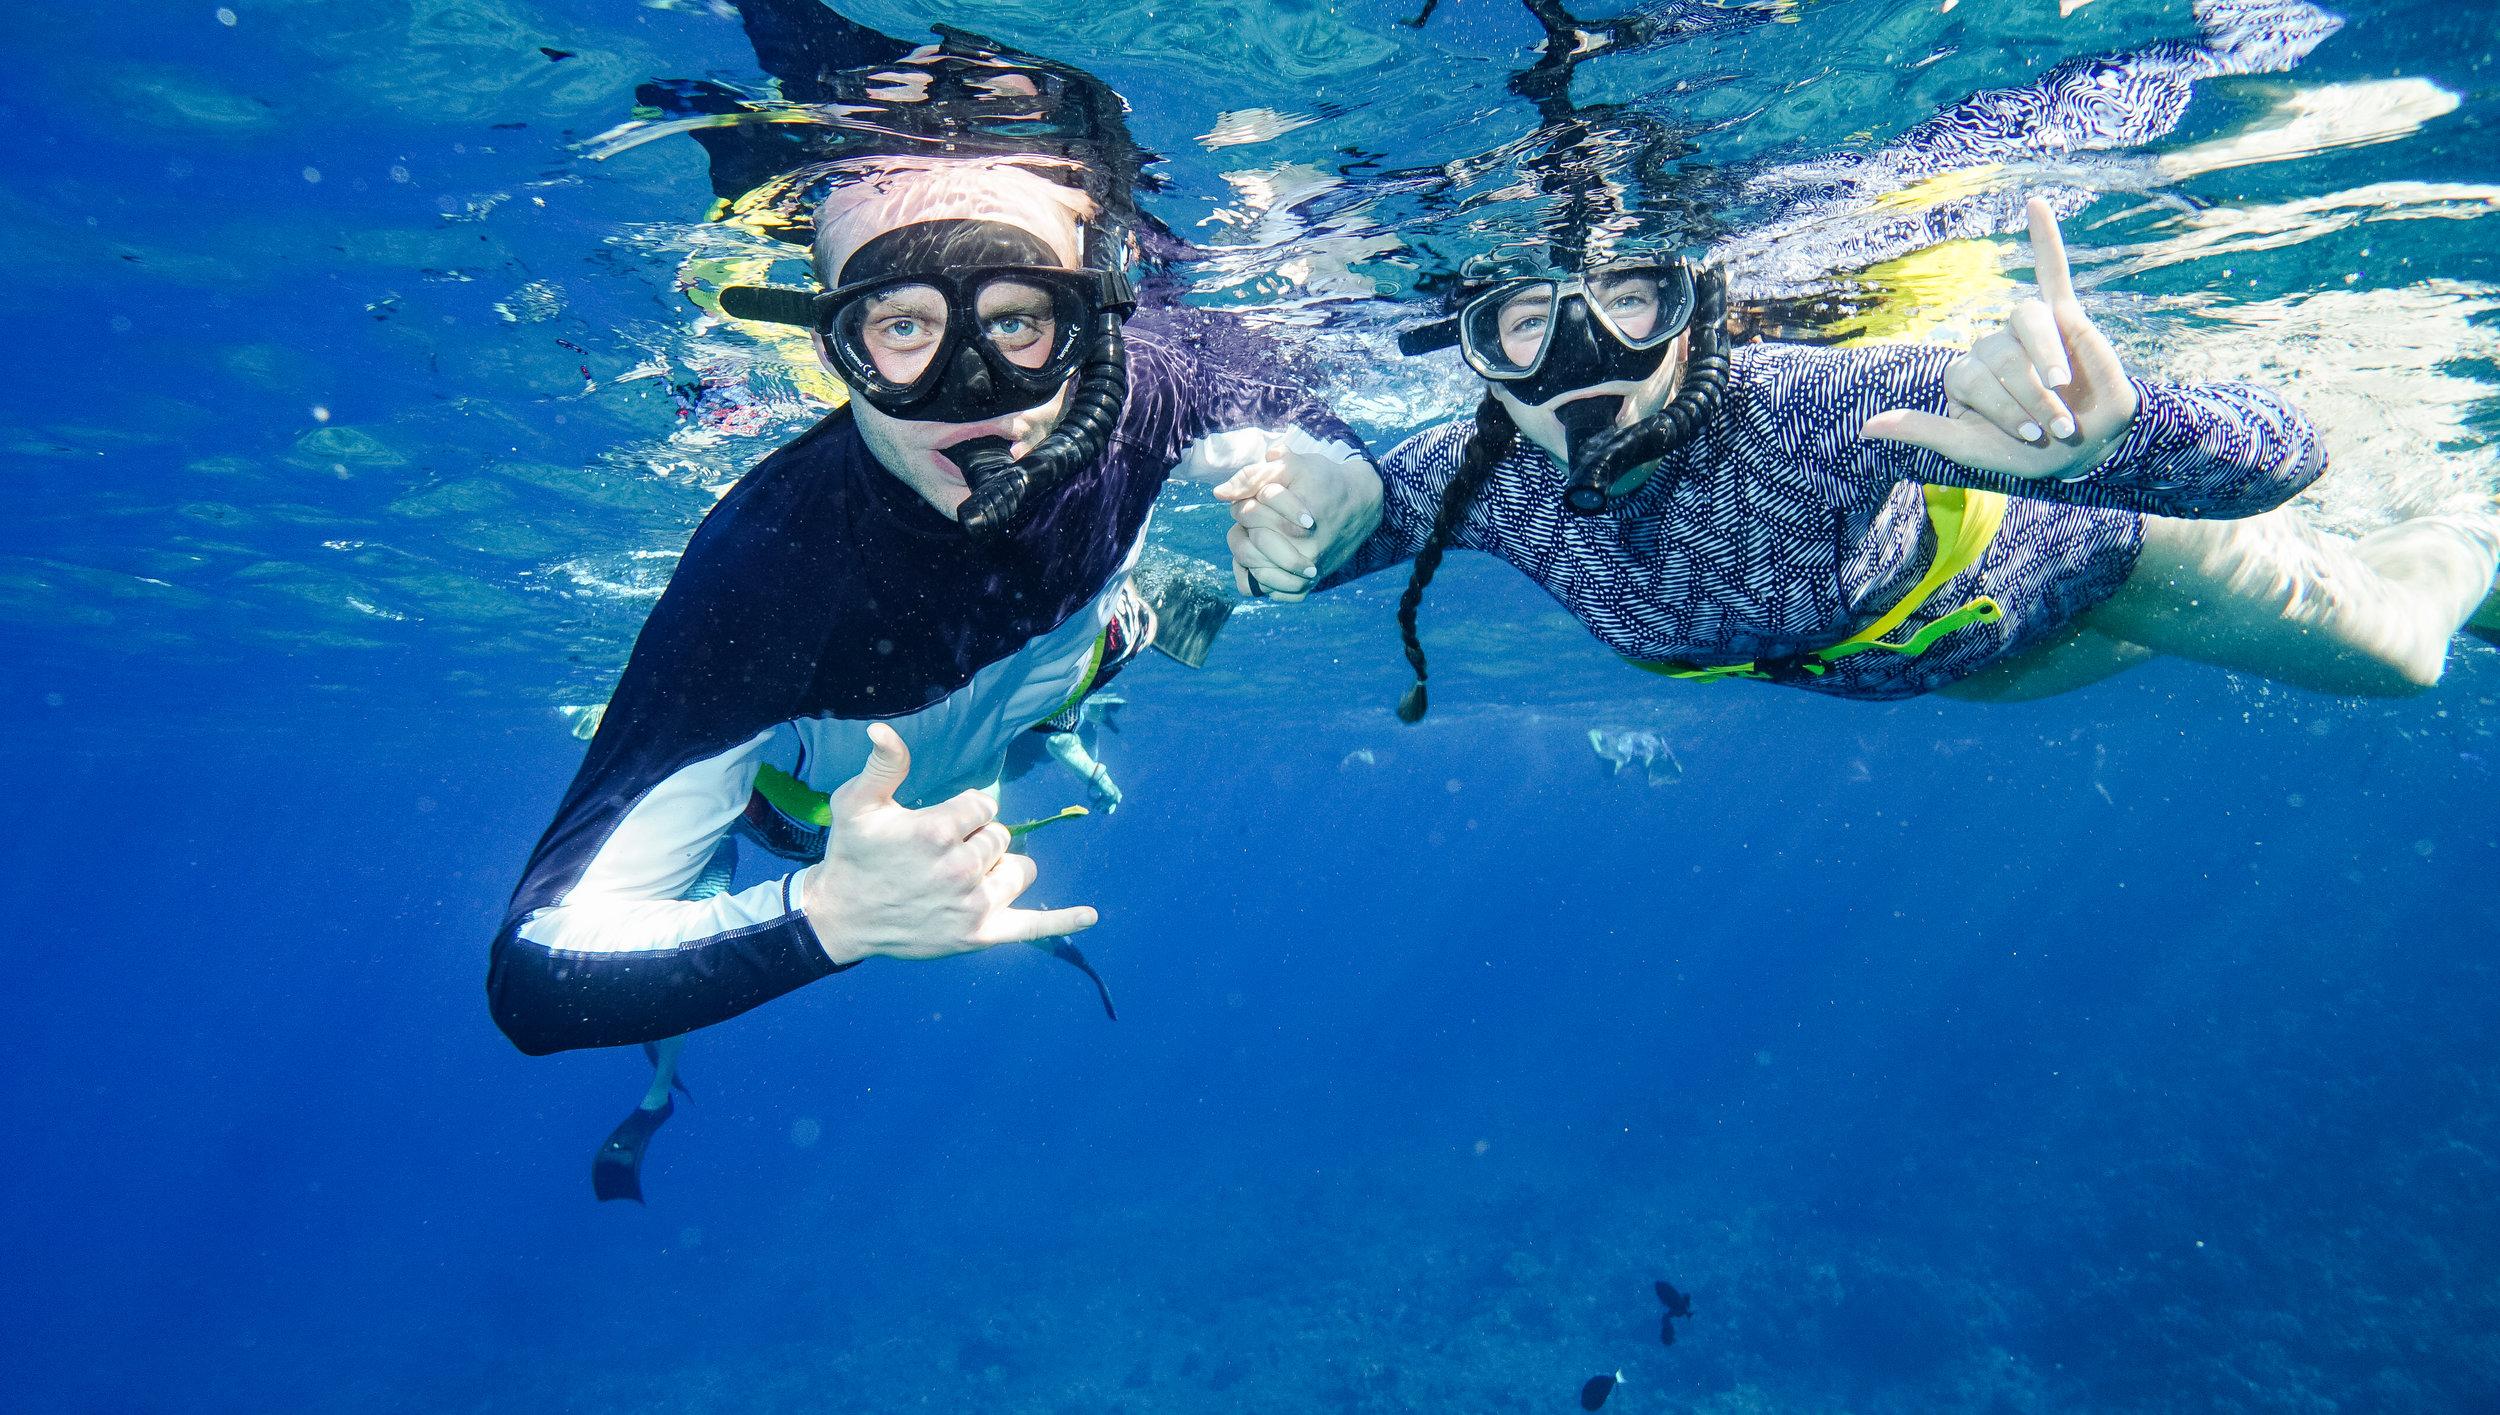 Snorkeling in Maui Hawaii - Morgan Tayler Photo & Design Vacation